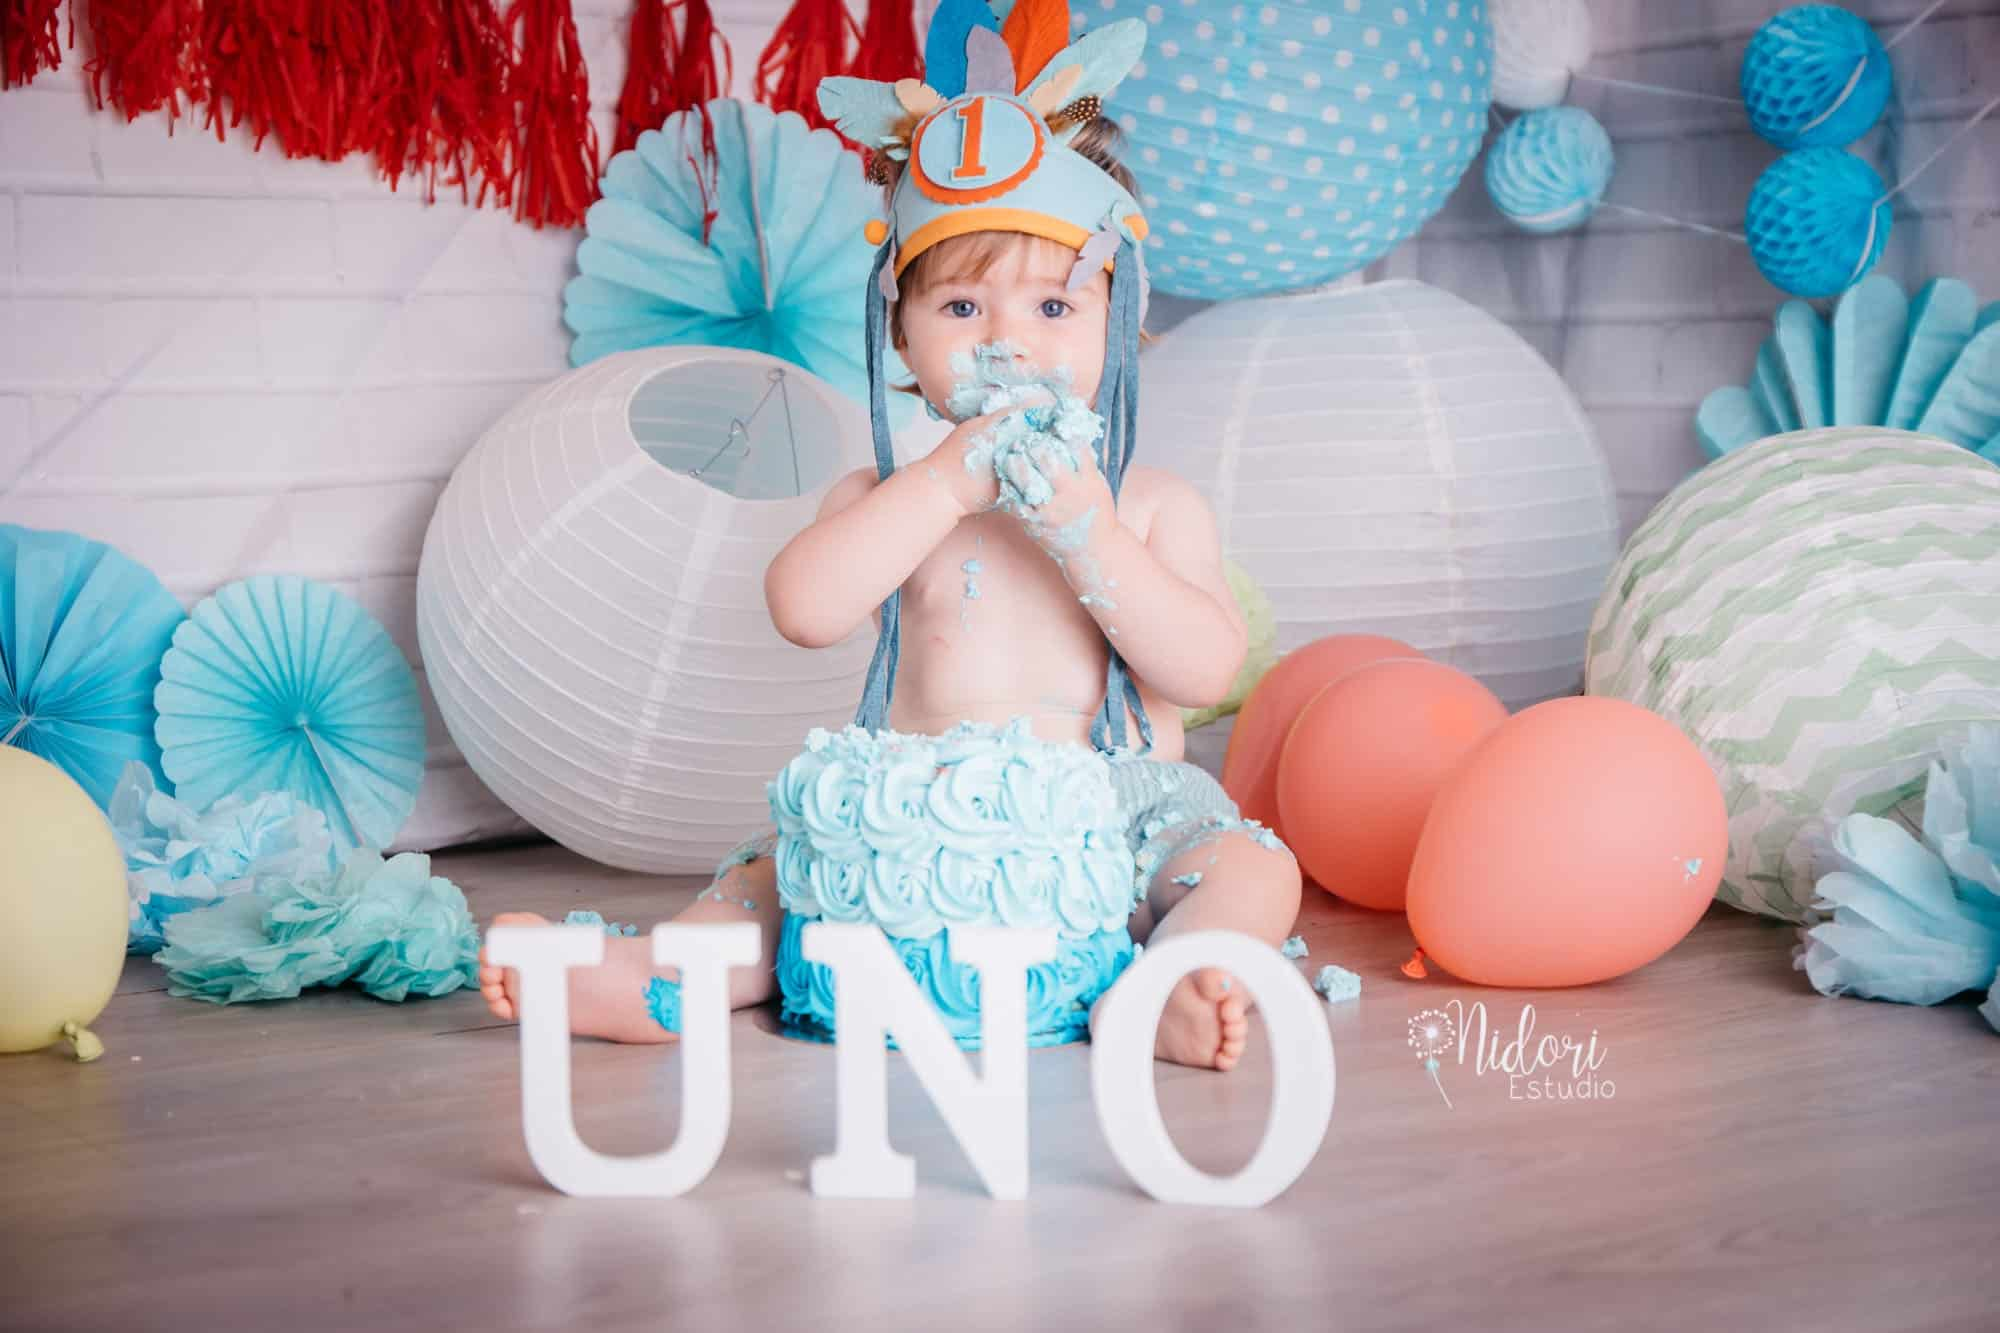 smash-cake-cumpleaños-tarta-fotografia-niños-bebes-nidoriestudio-fotos-valencia-almazora-castellon-españa-spain-23